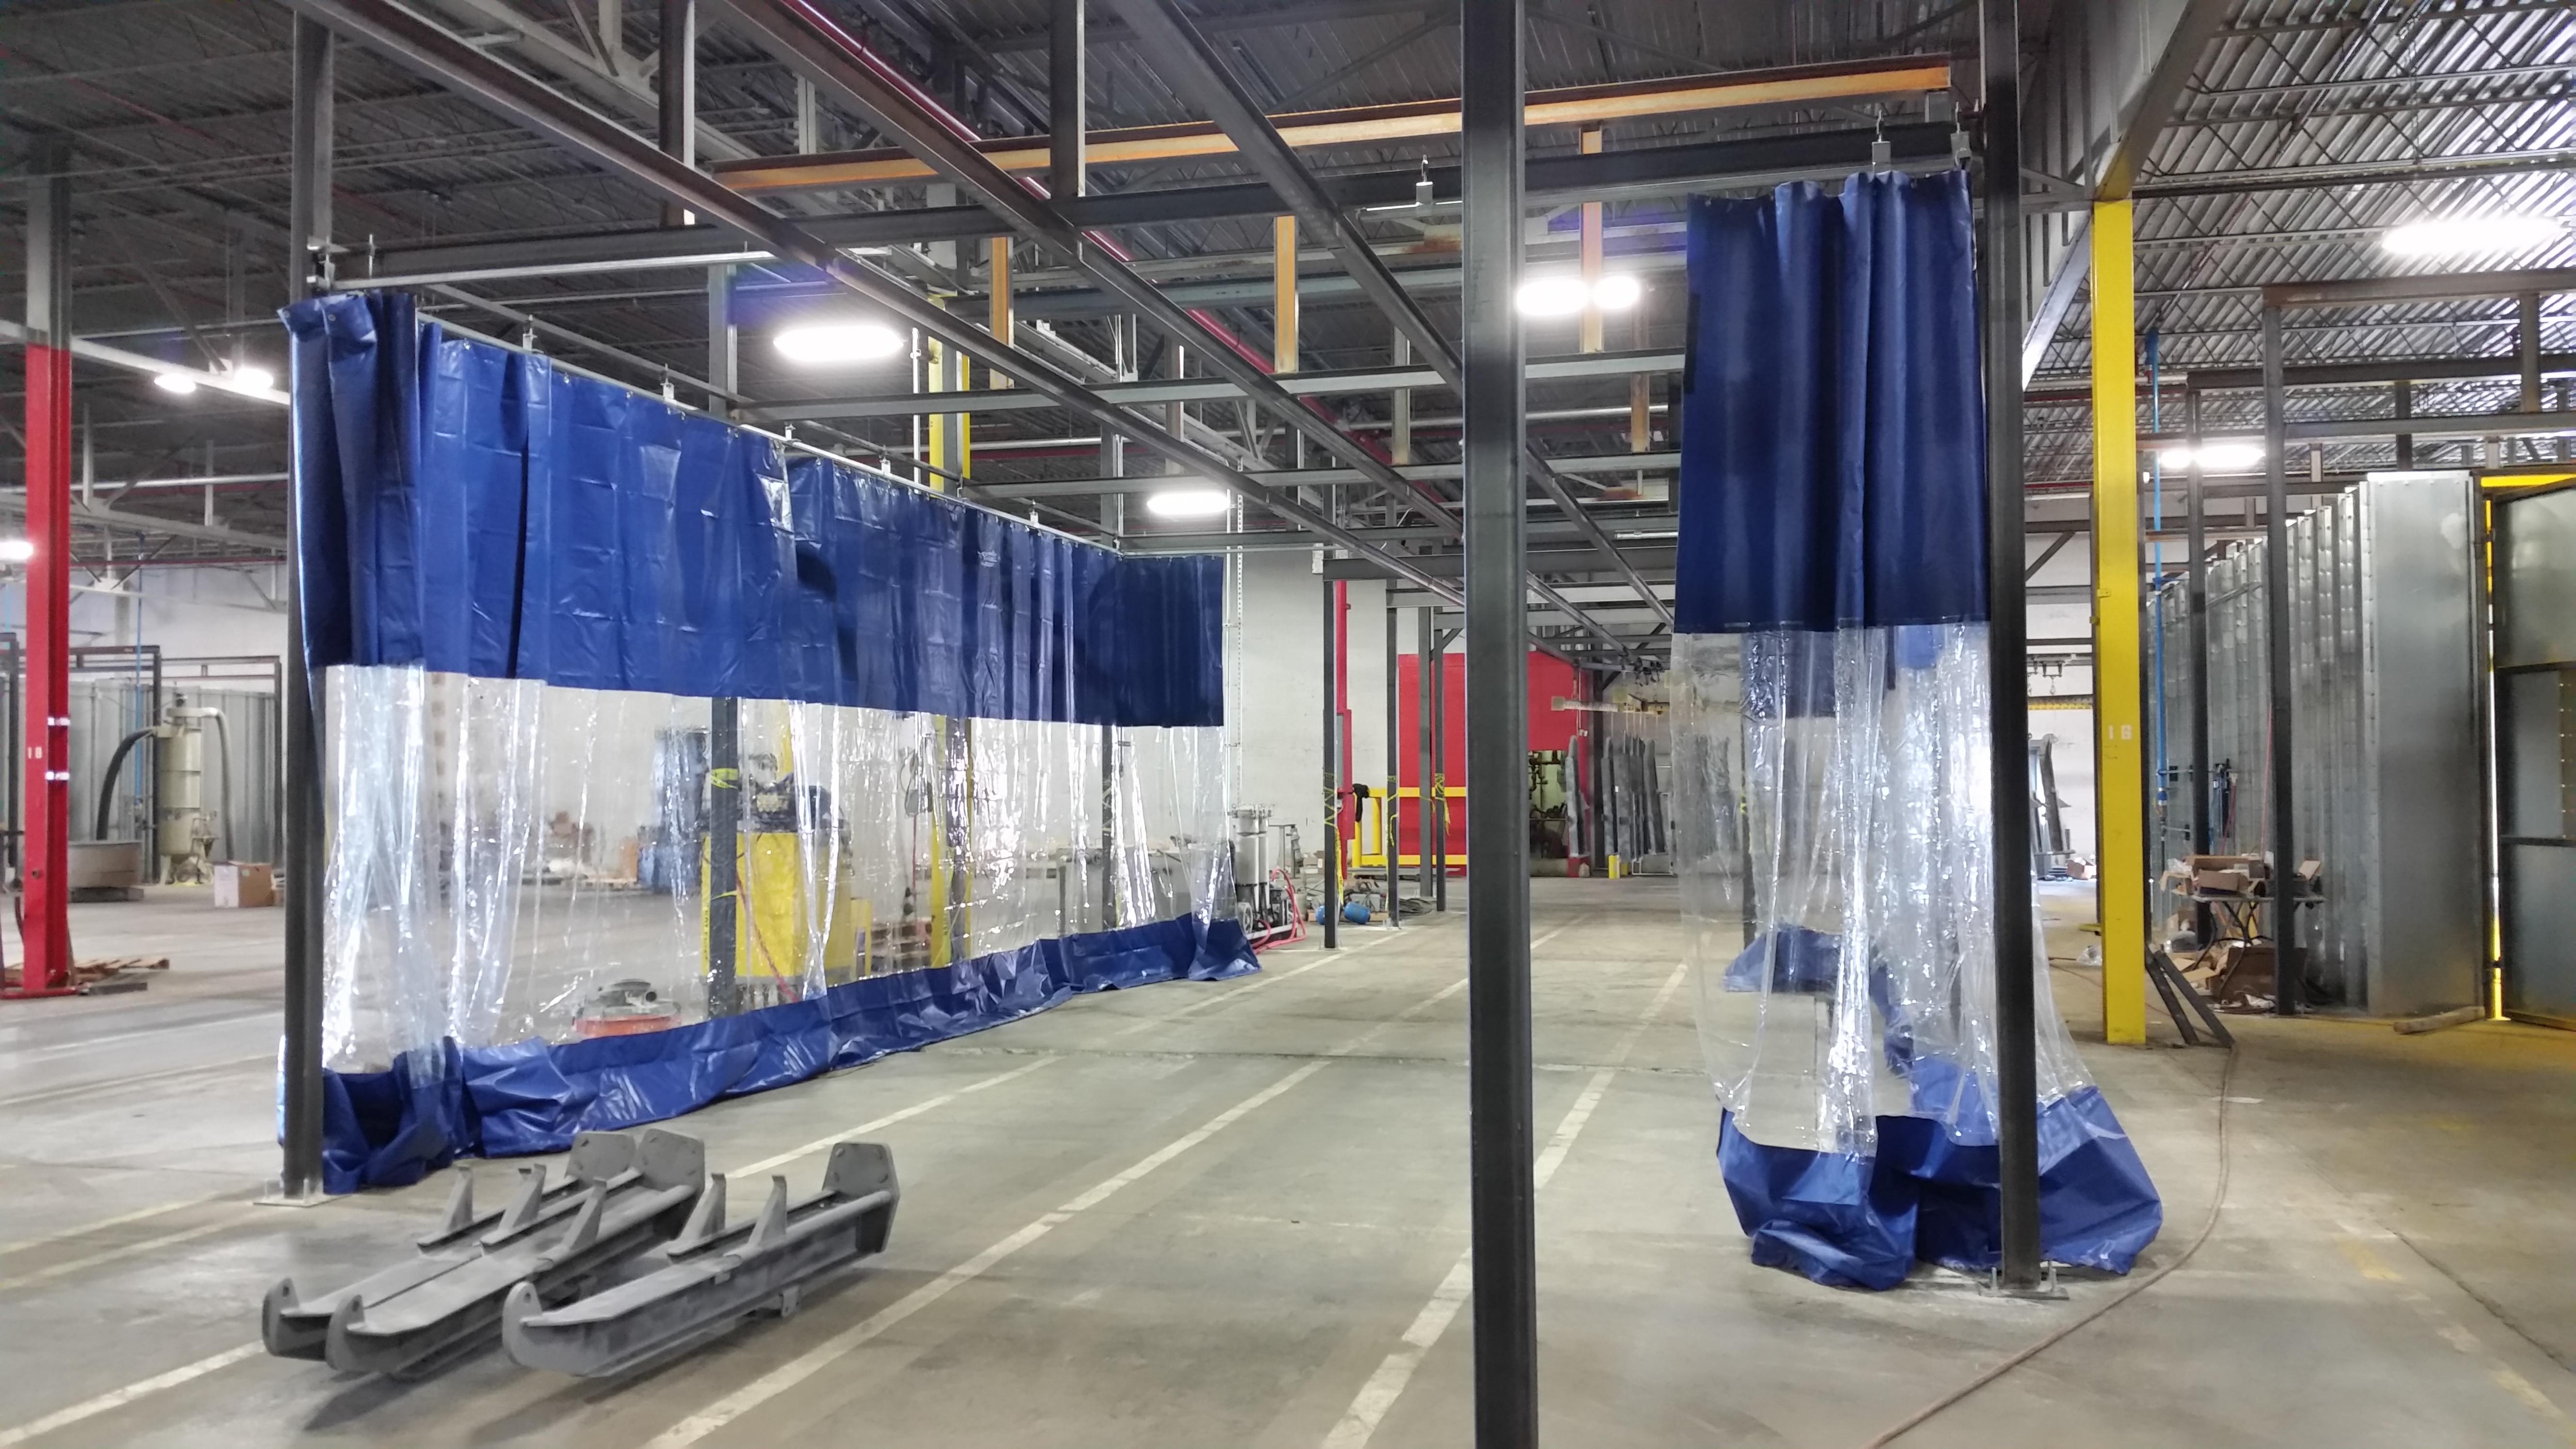 Paint Amp Powder Pretreatment Washer Manufacturer Trimac